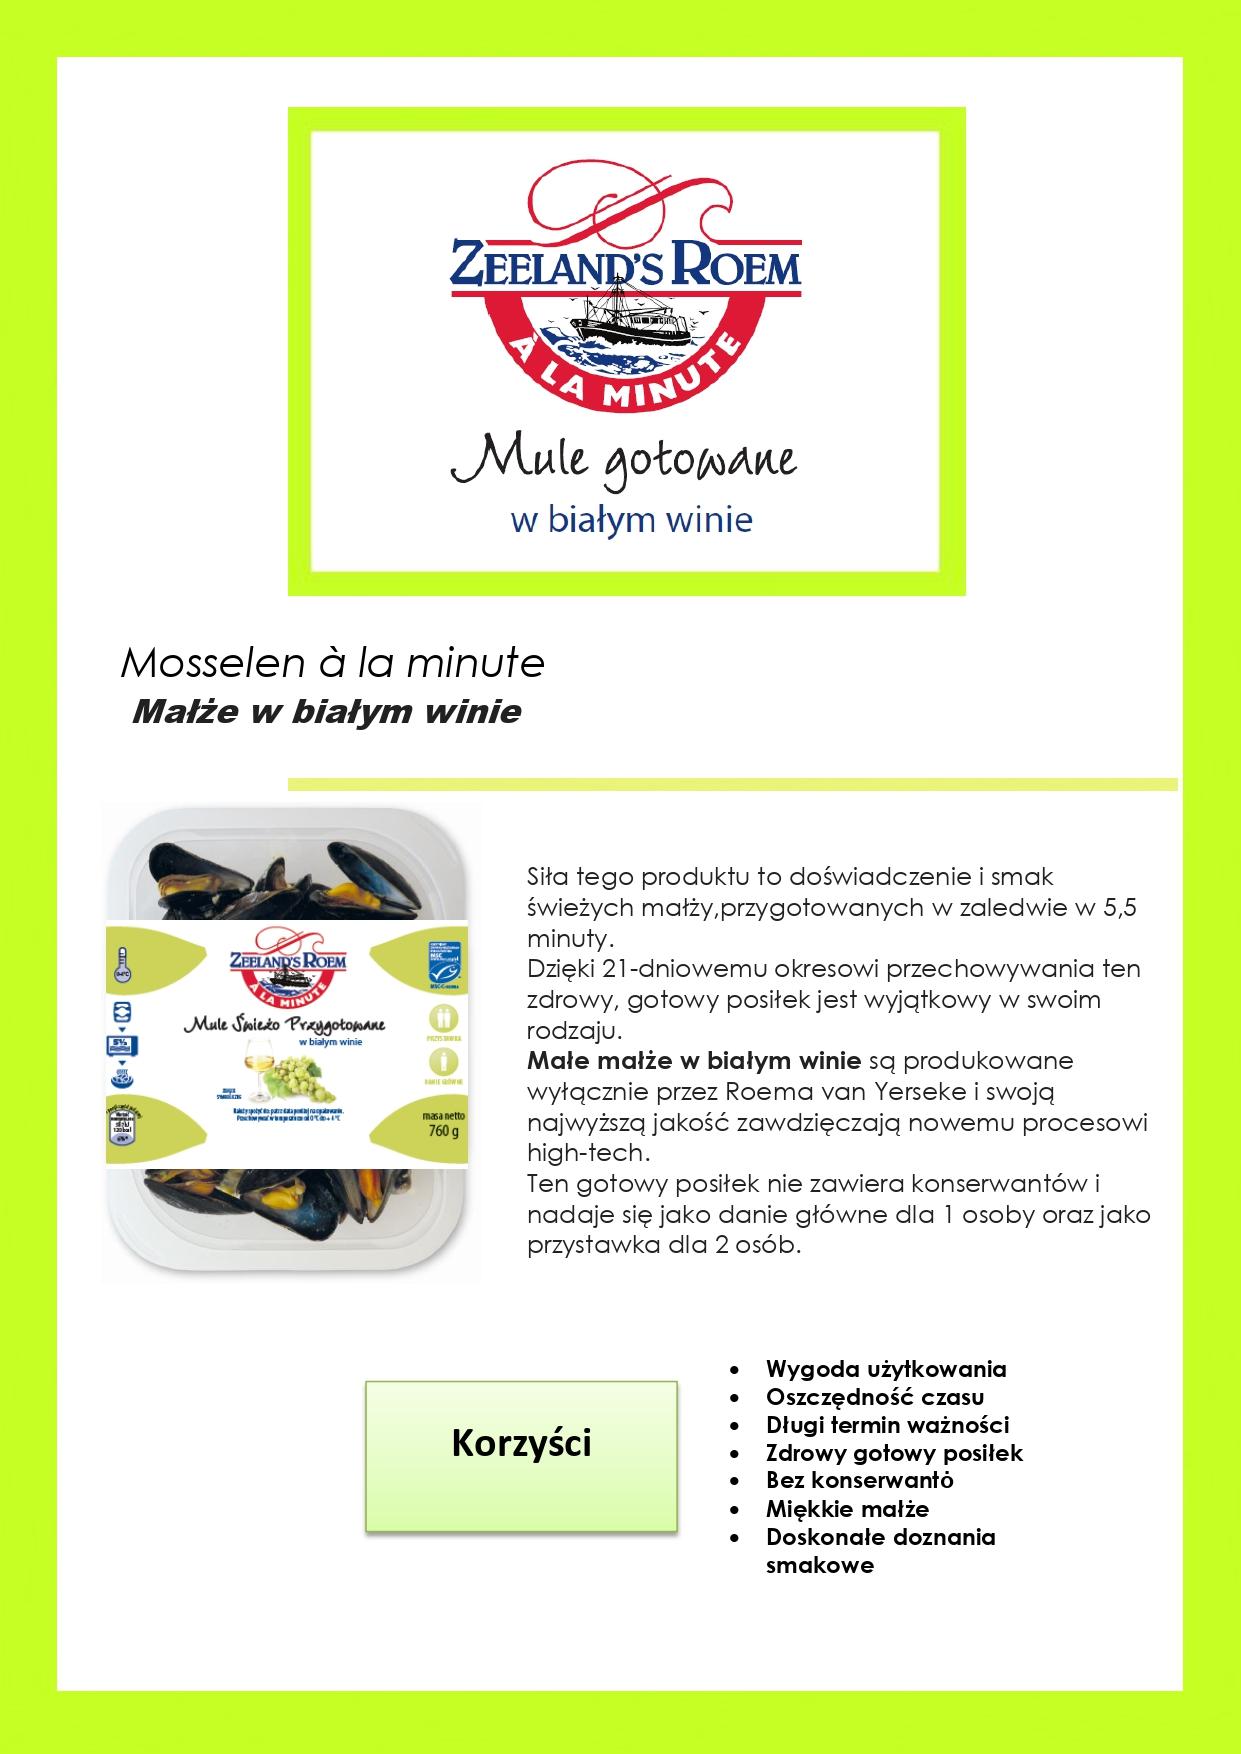 MALM witte wijn ZR leaflet PL_page-0001jpg